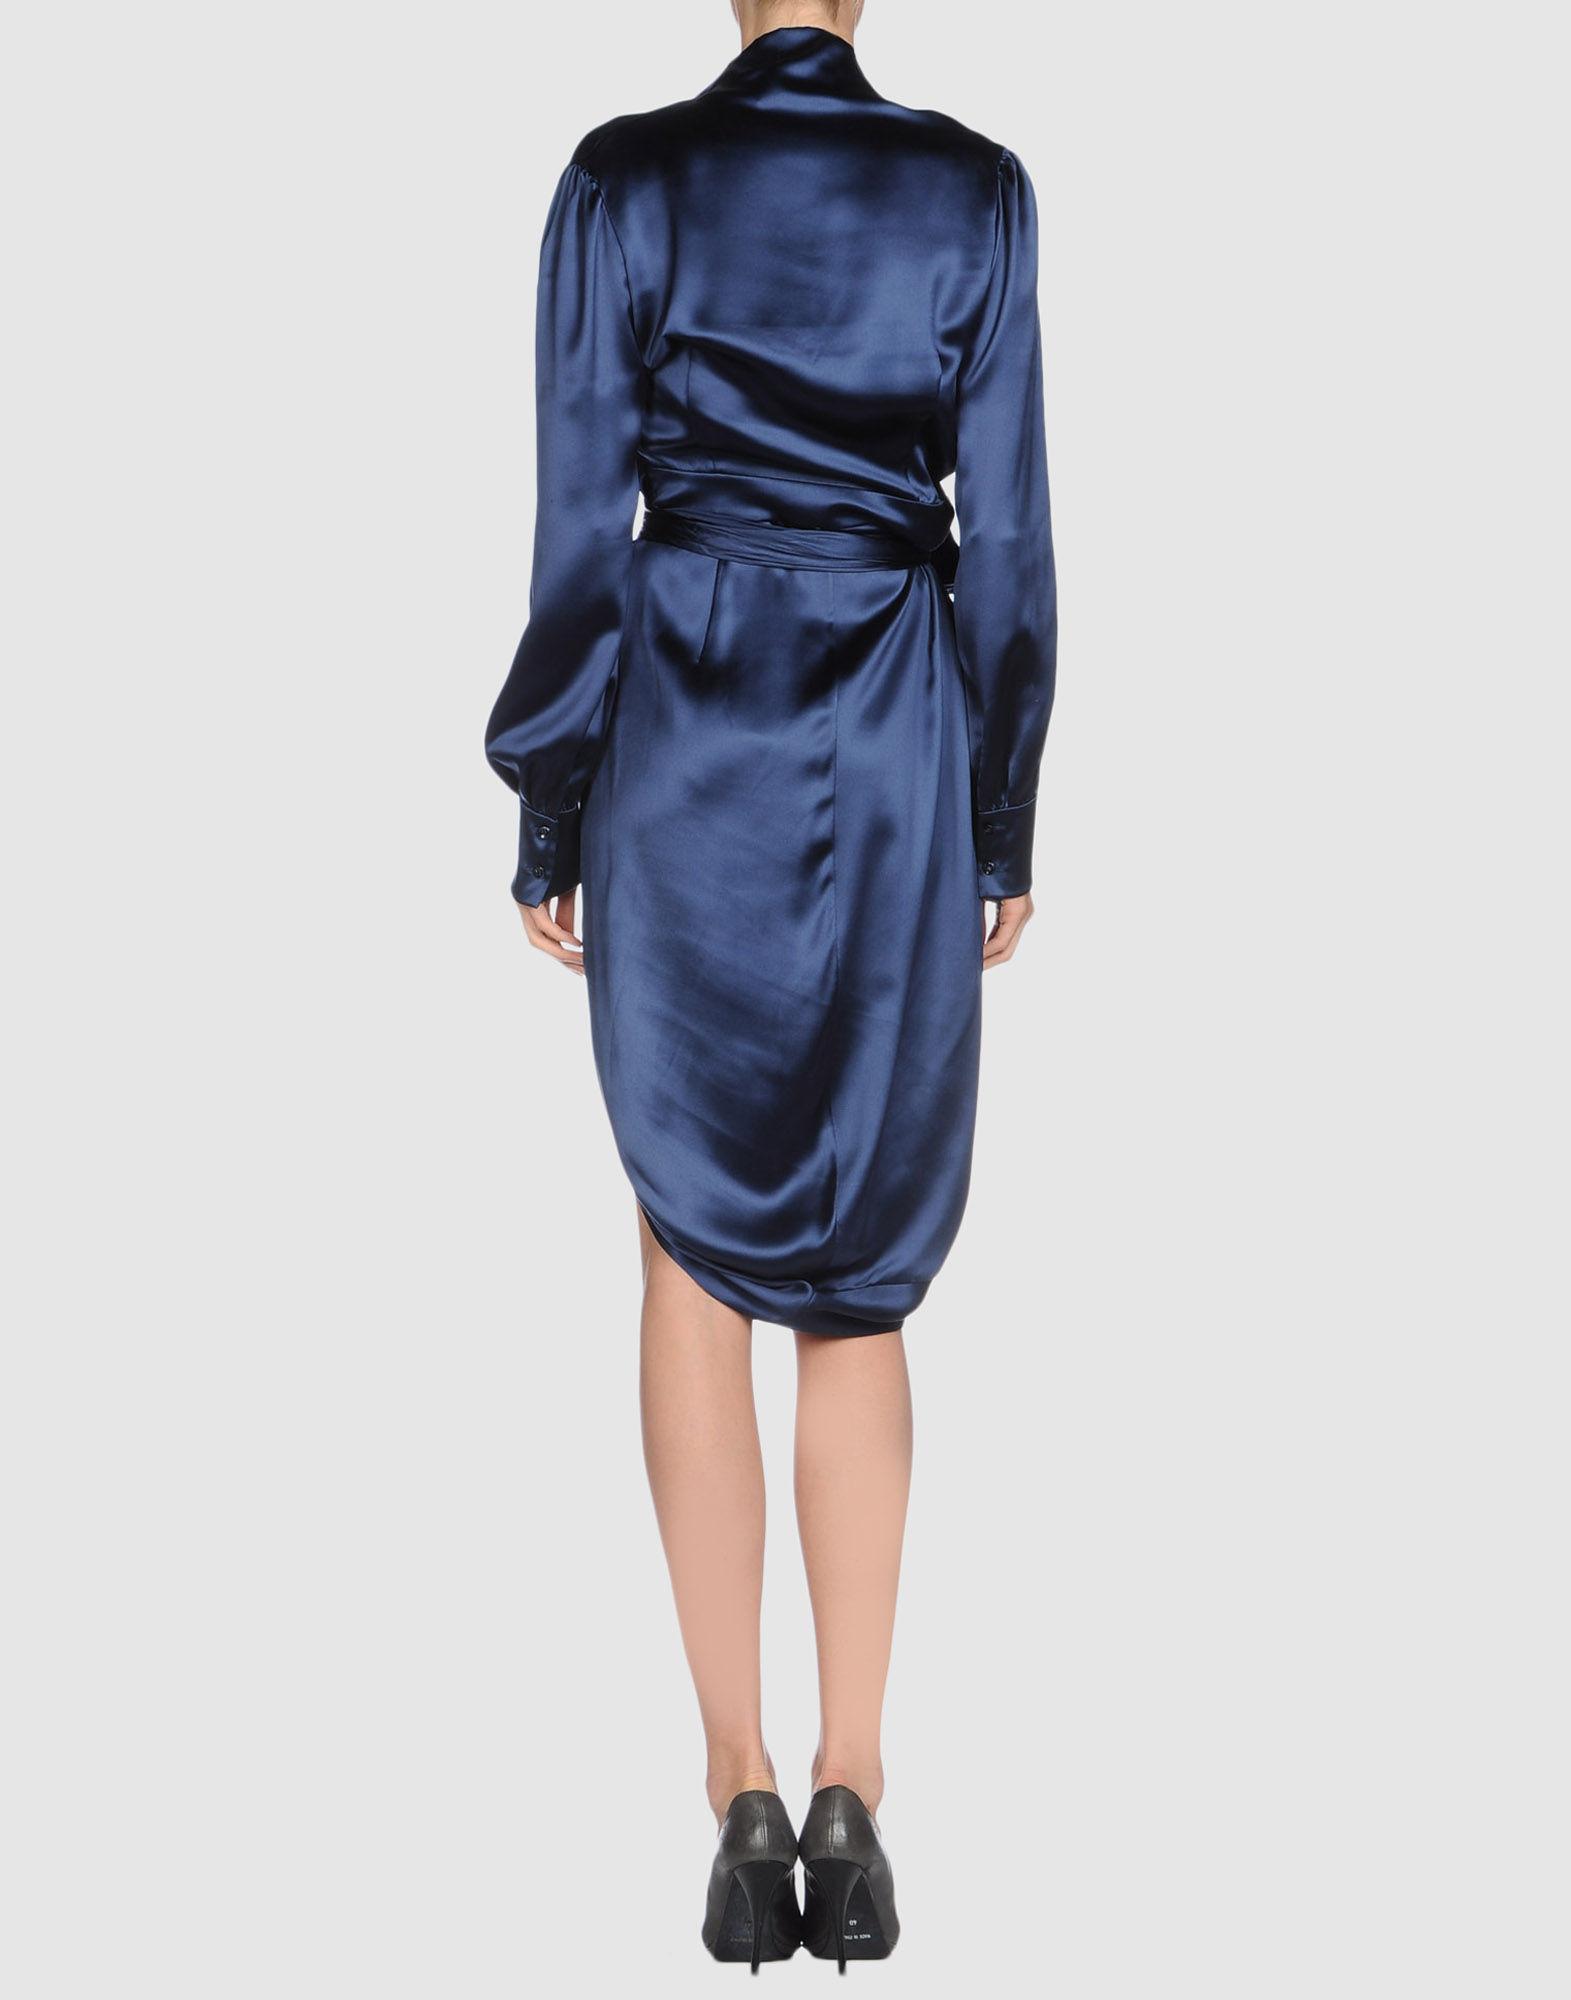 34218382MO 14 r - Βραδυνα Φορεματα Yves Saint Laurent Rive Gauche Κωδ.04